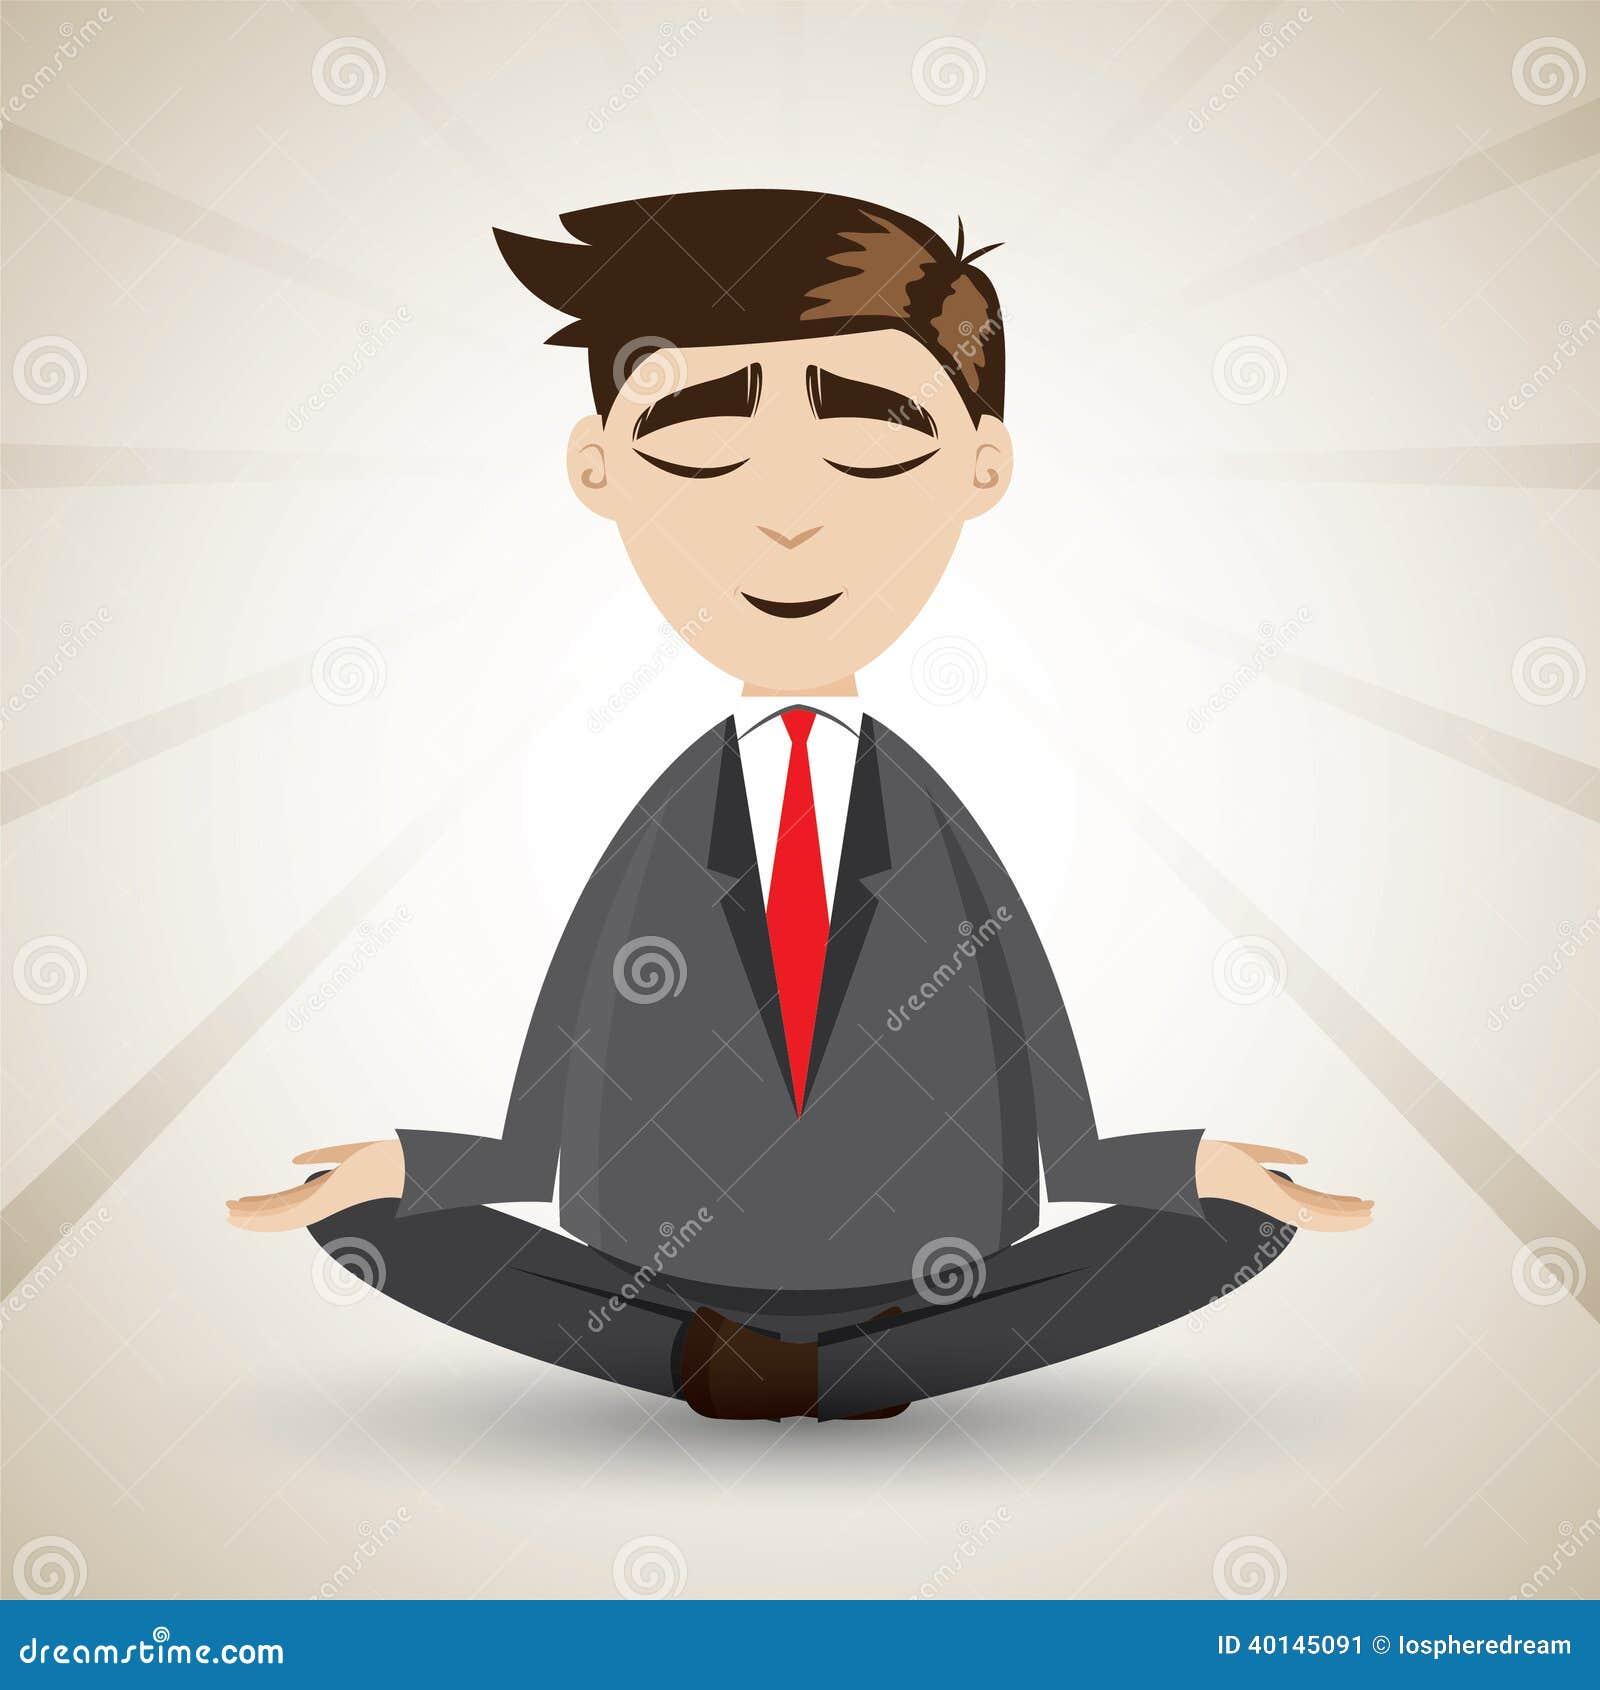 Cartoon Businessman Relaxing With Meditation Stock Vector